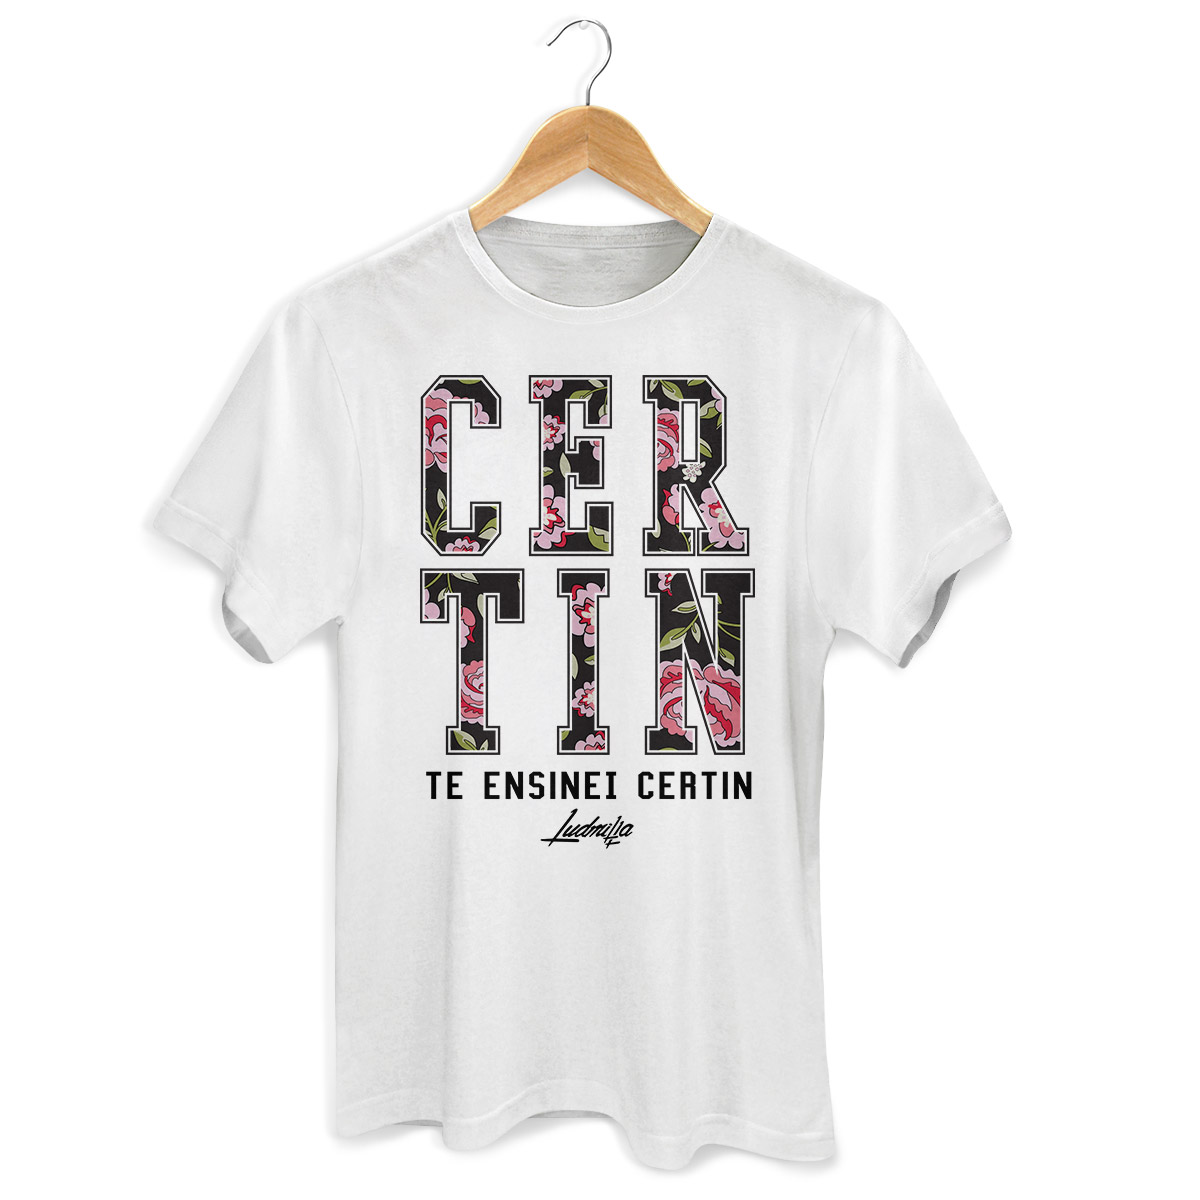 Camiseta Masculina Ludmilla Certin